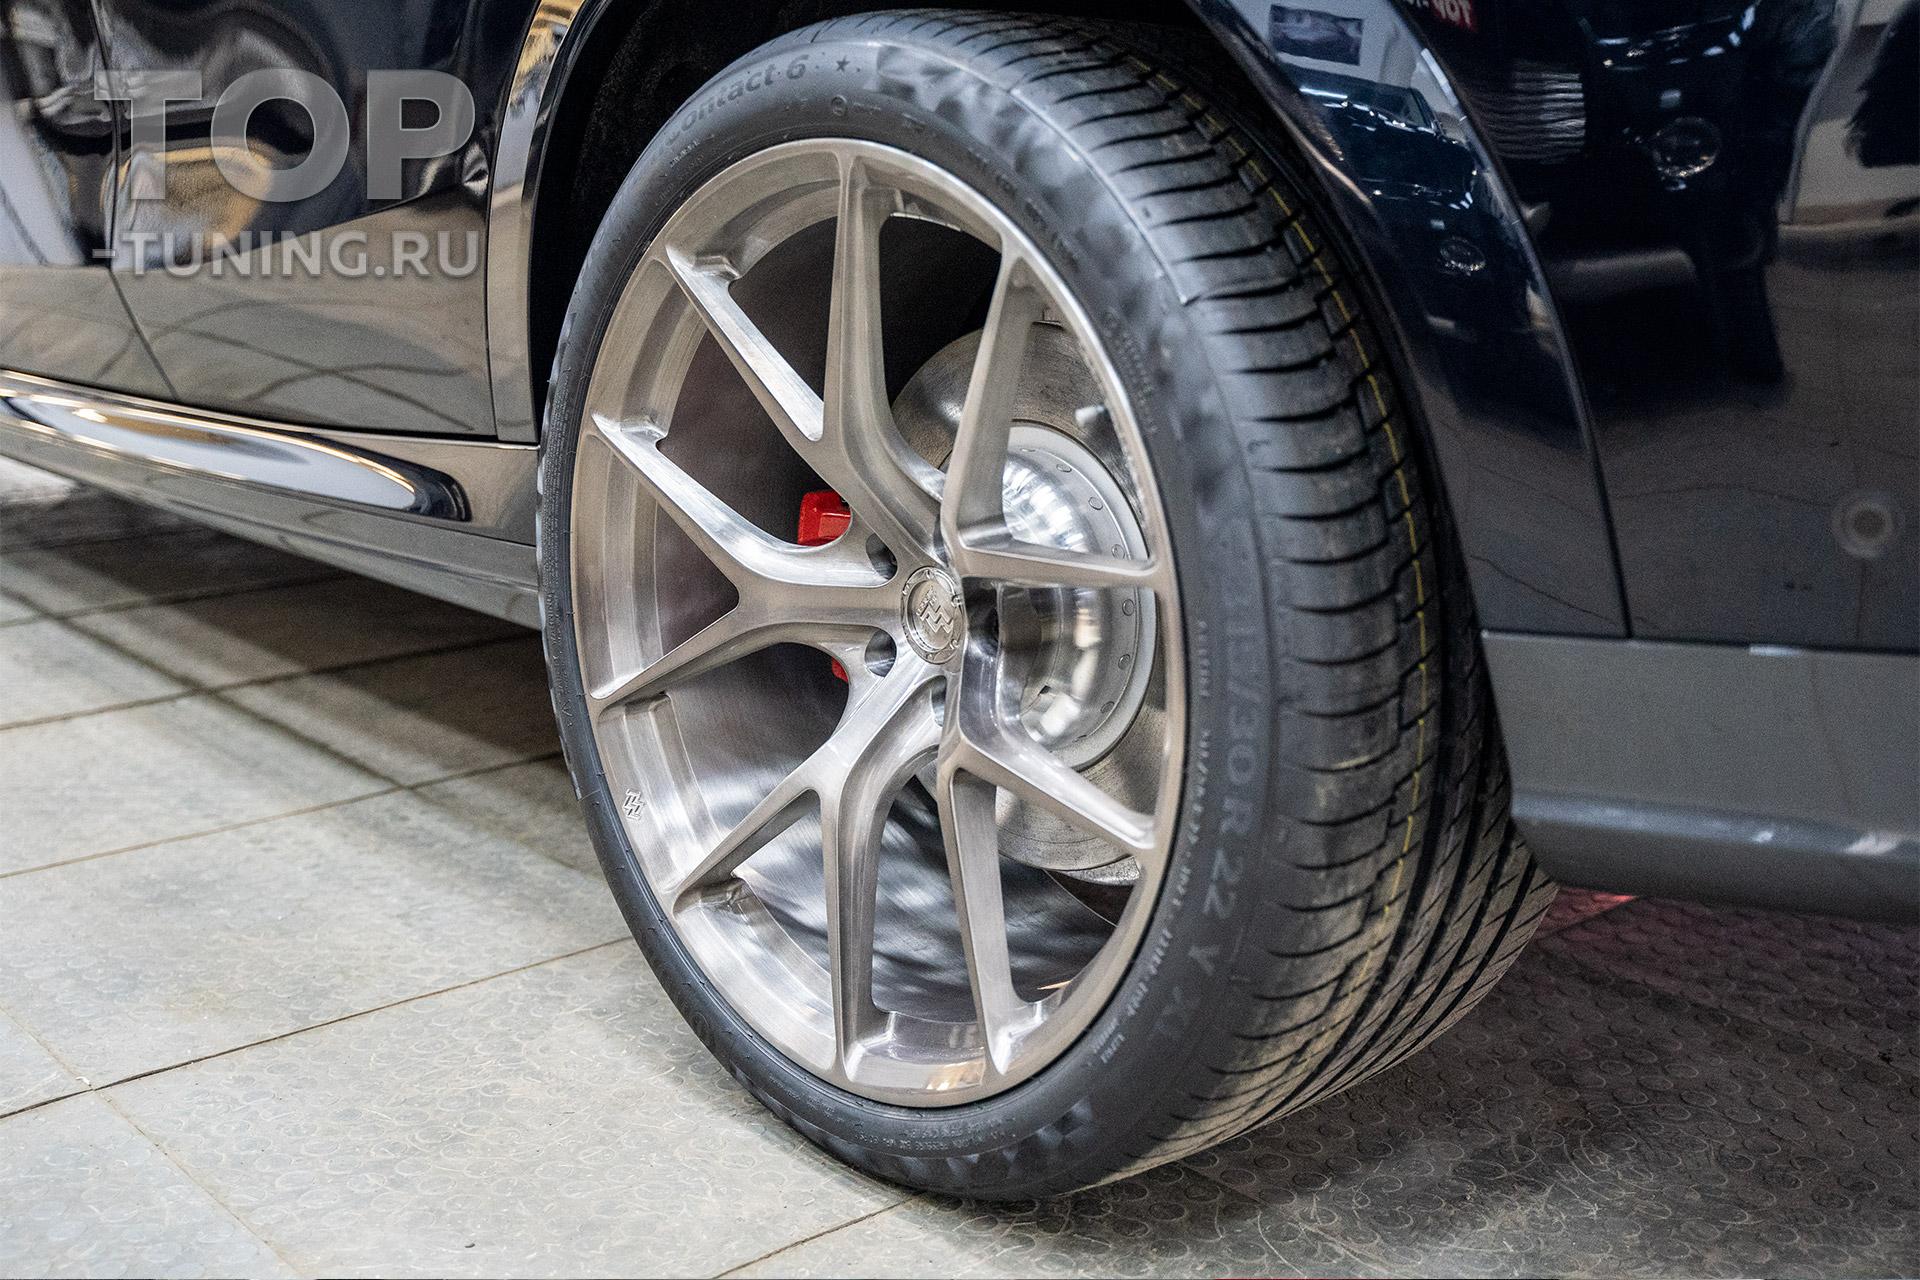 Диски R22 Forged для BMW X6 G06 (кованные, разноширокие)